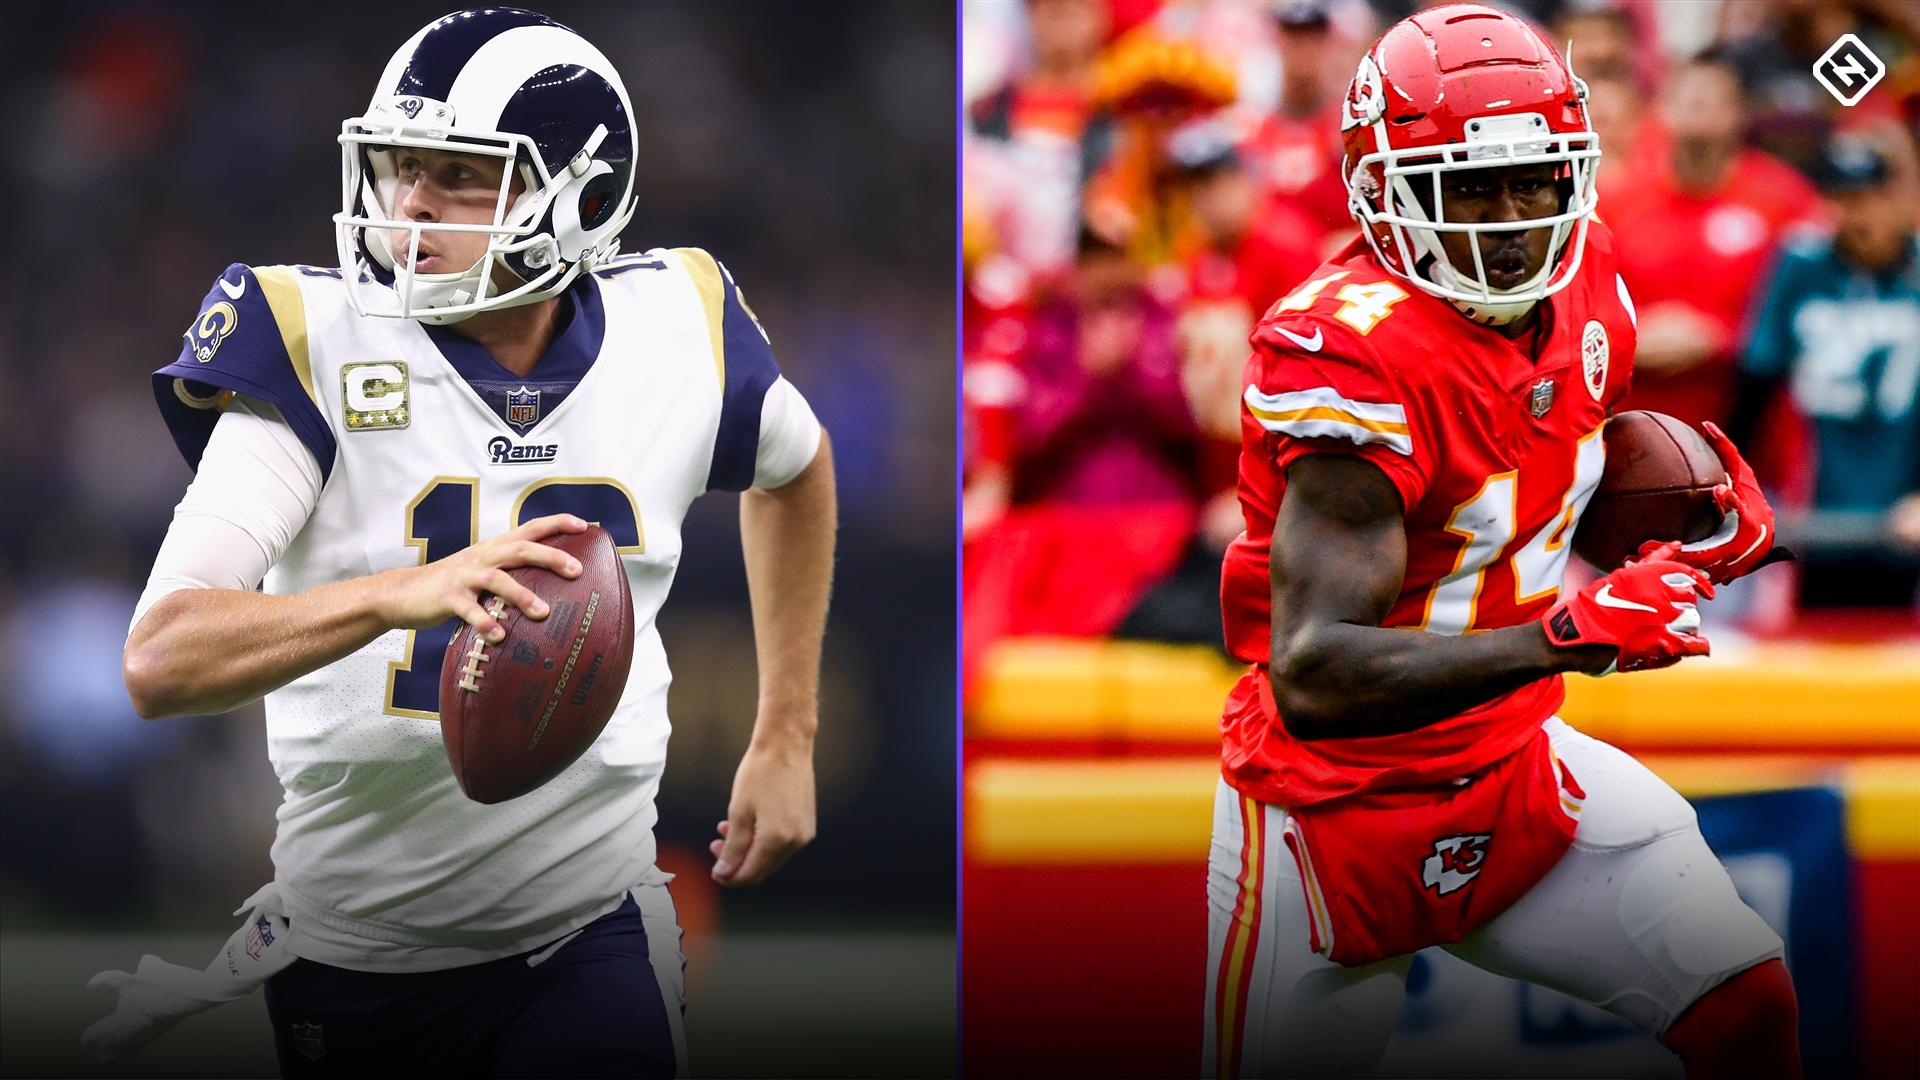 Fantasy Football Start 'Em Sit 'Em Week 11: Go all-in on offense-heavy Chiefs-Rams battle